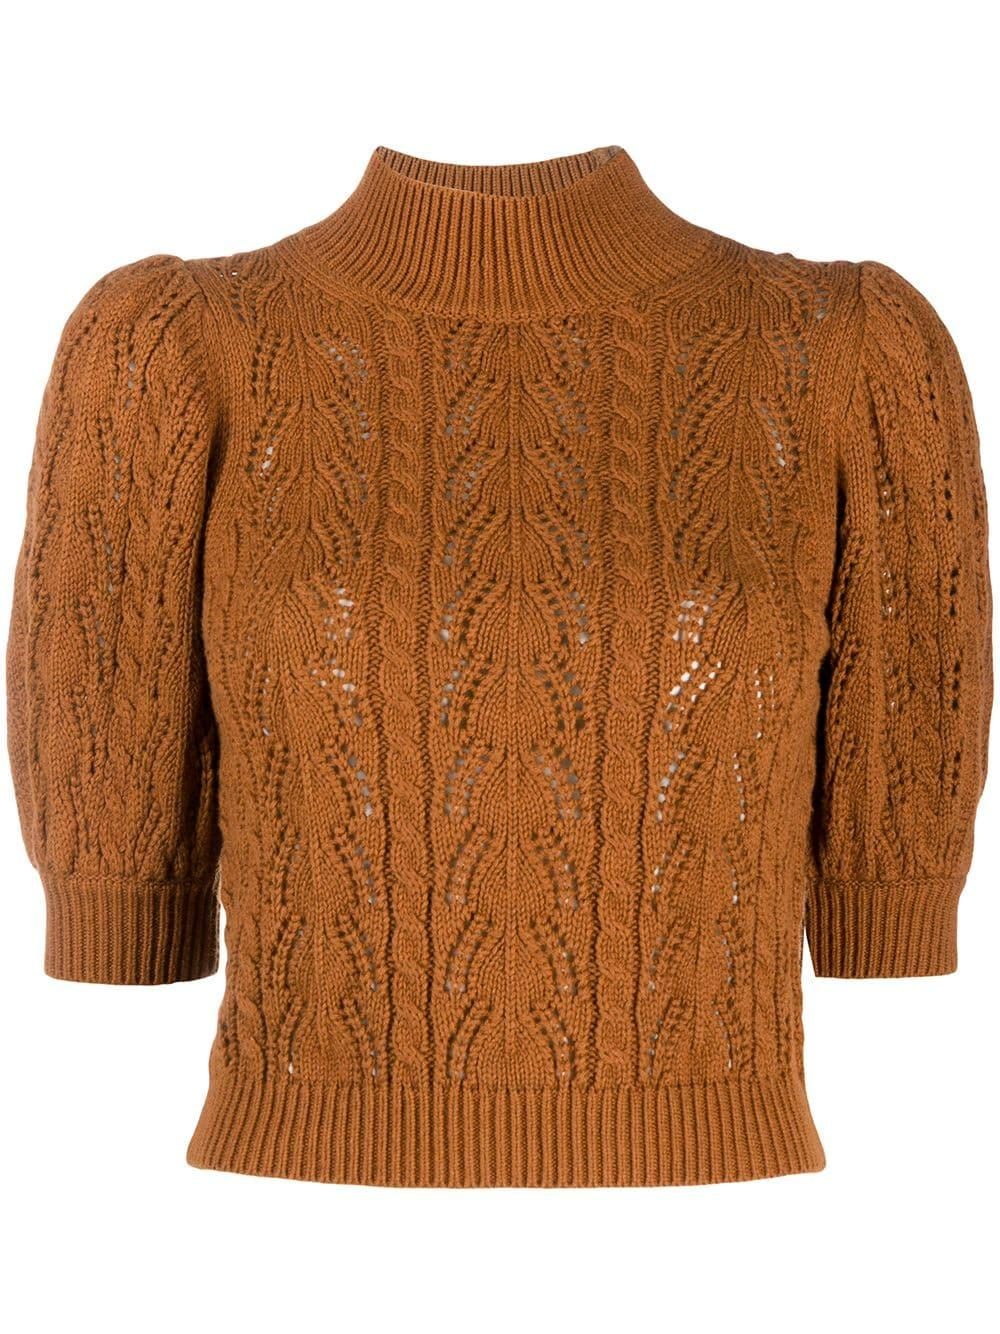 Kyoko Sweater Item # CC007S10705